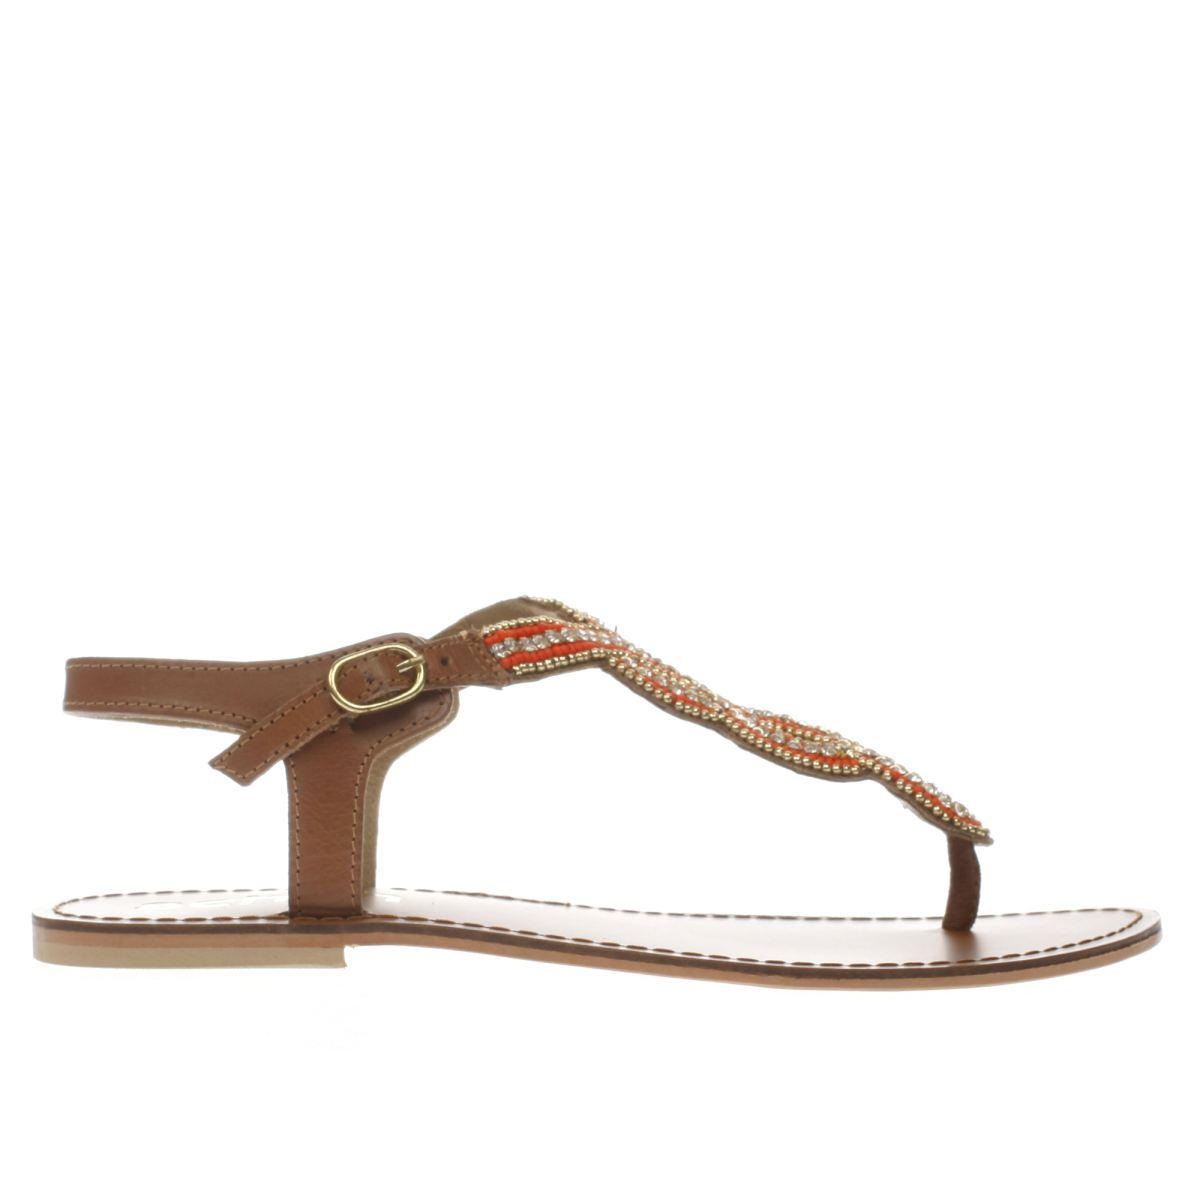 schuh tan radiance sandals